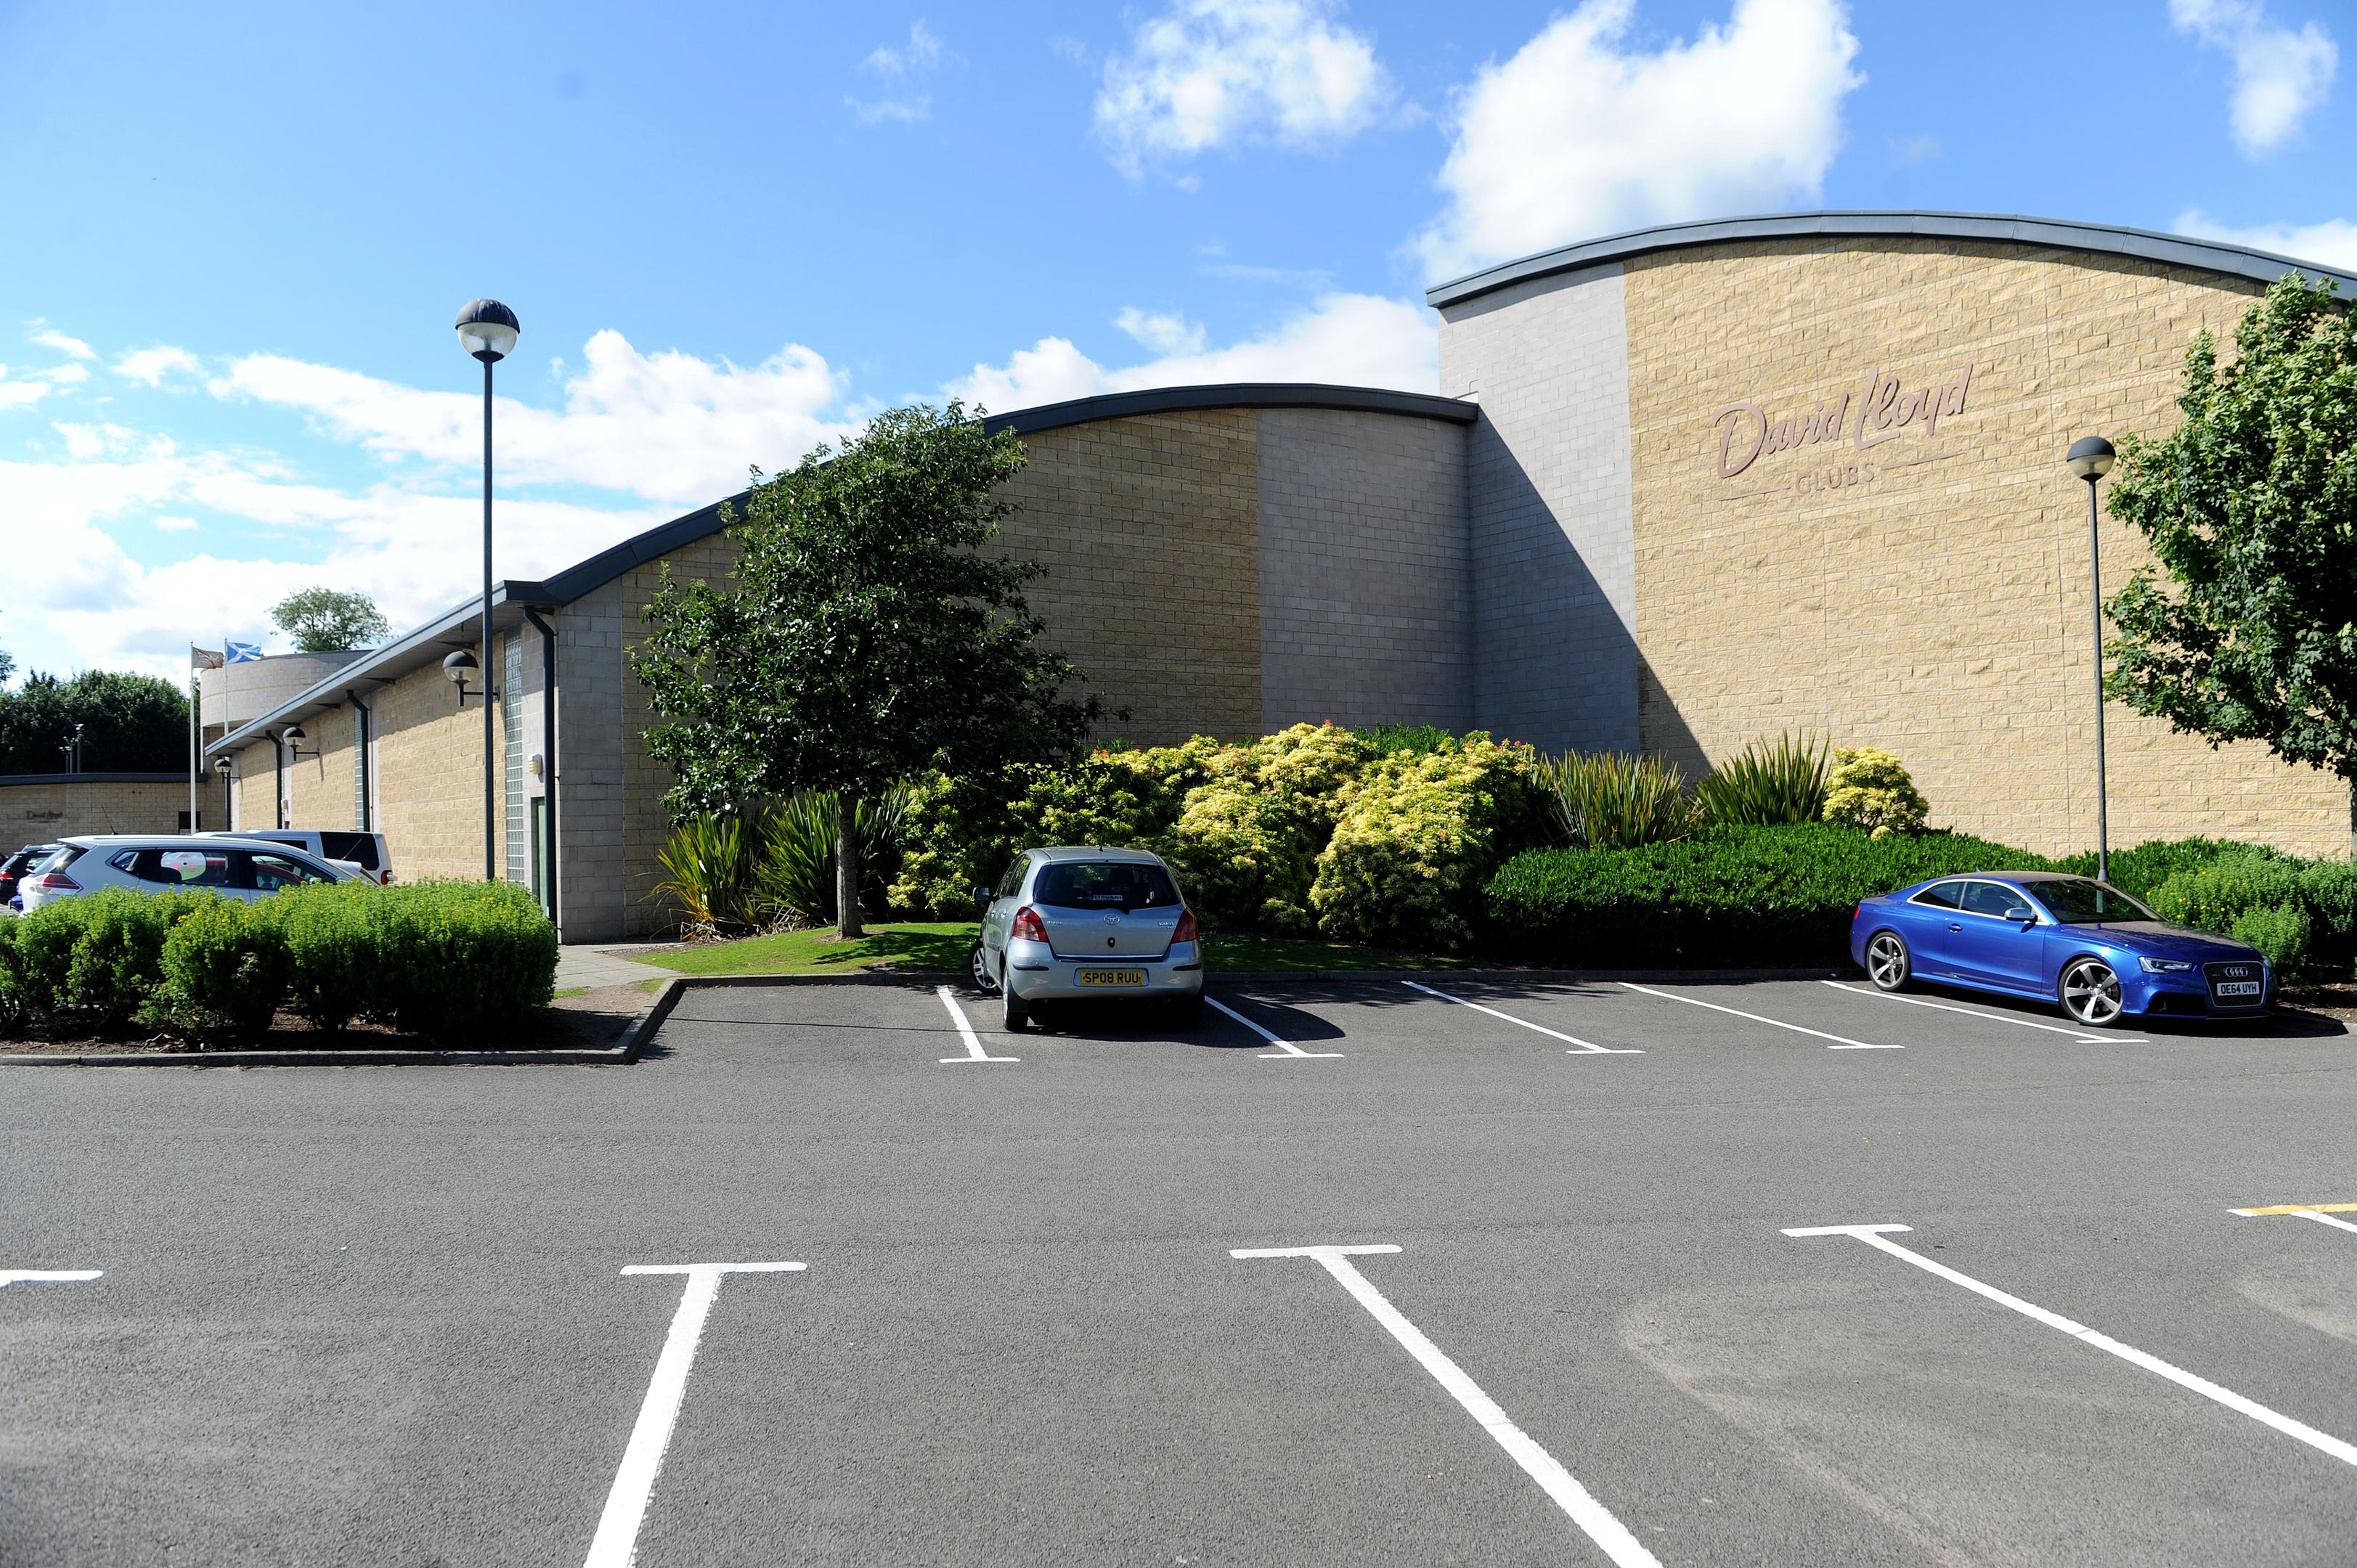 The David Lloyd fitness club at Ethiebeaton Park